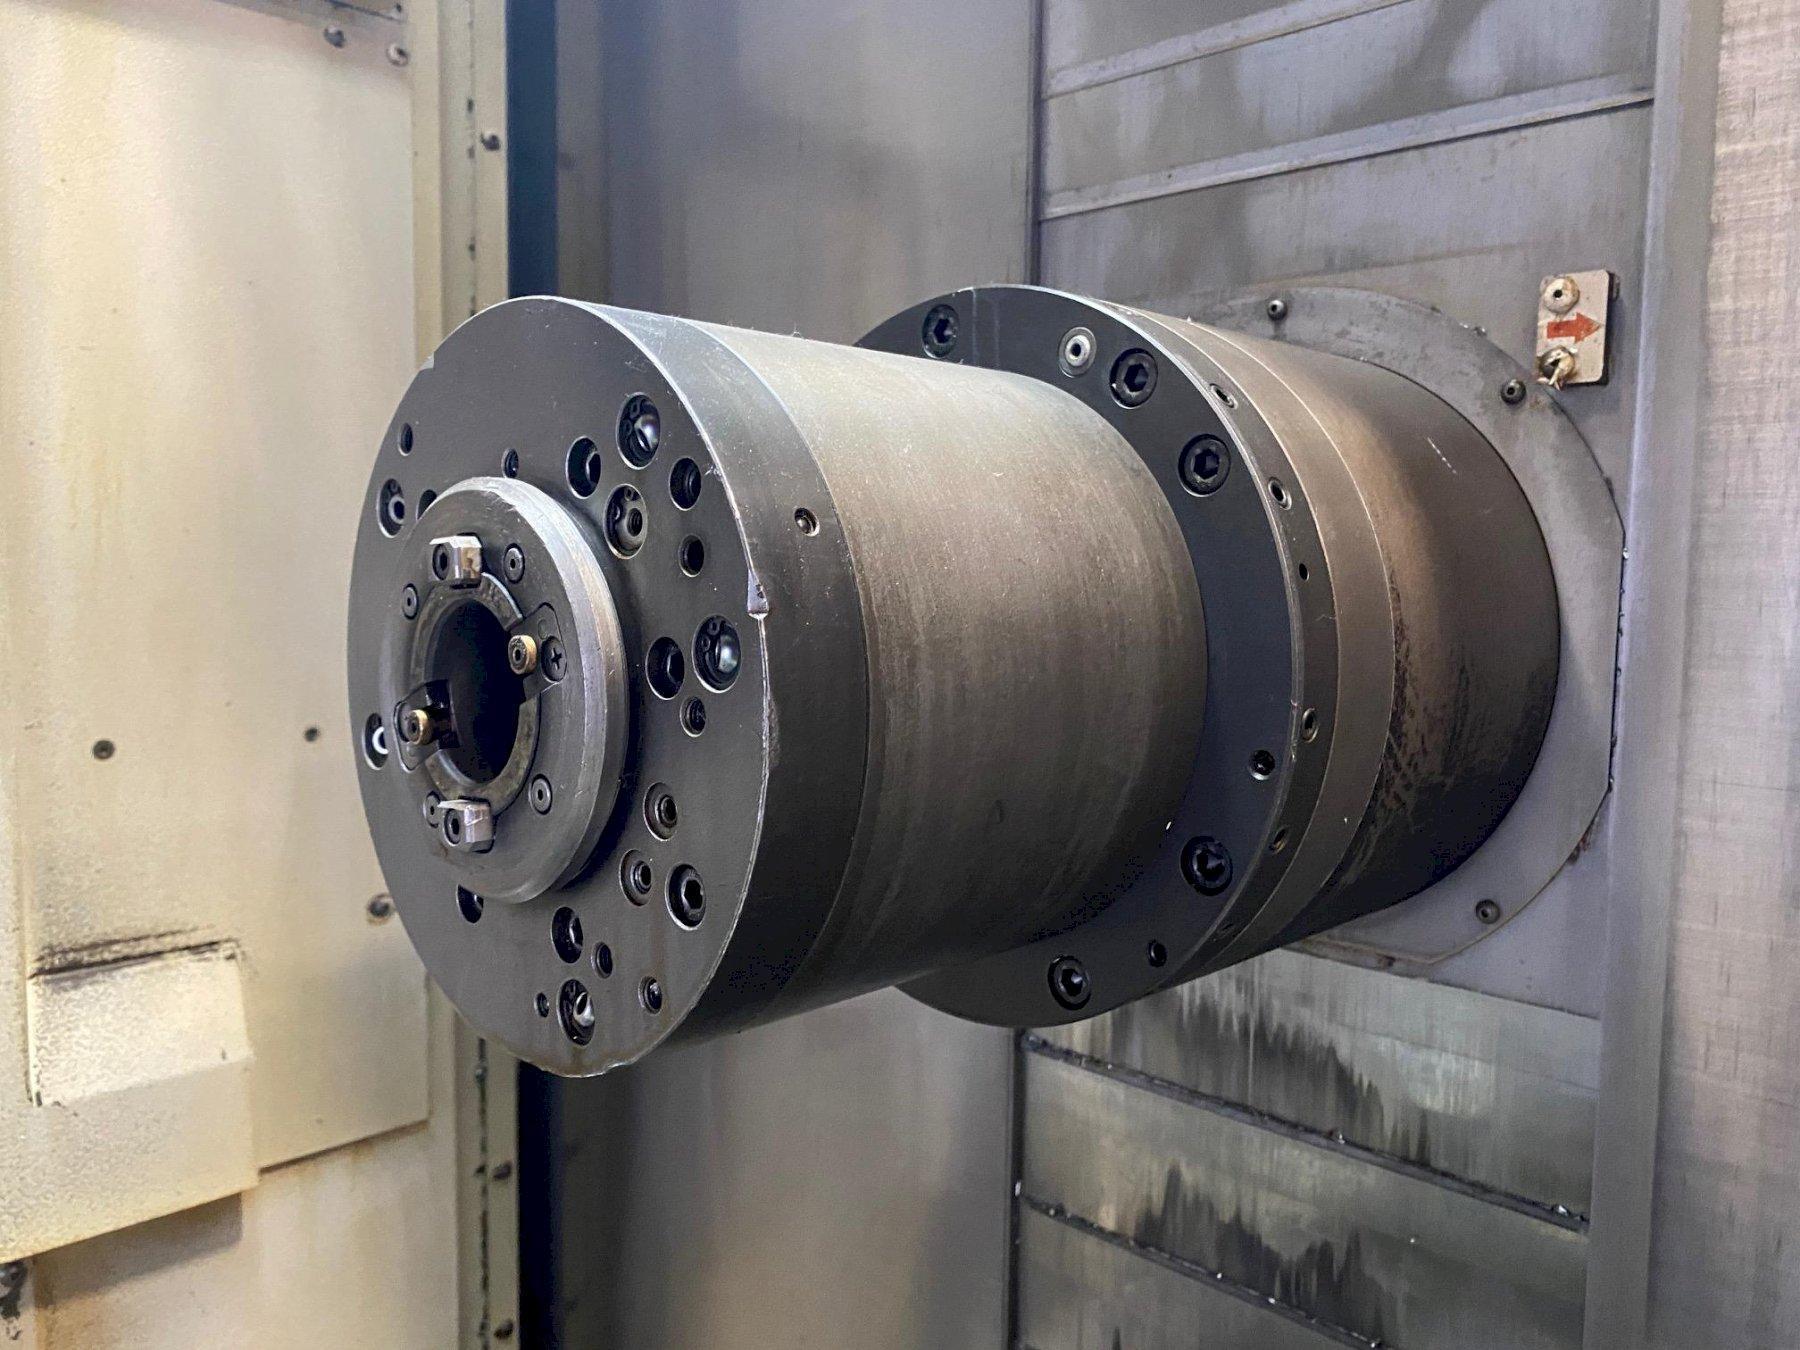 Mori Seiki NH-5000dcg CNC Horizontal Machining Center